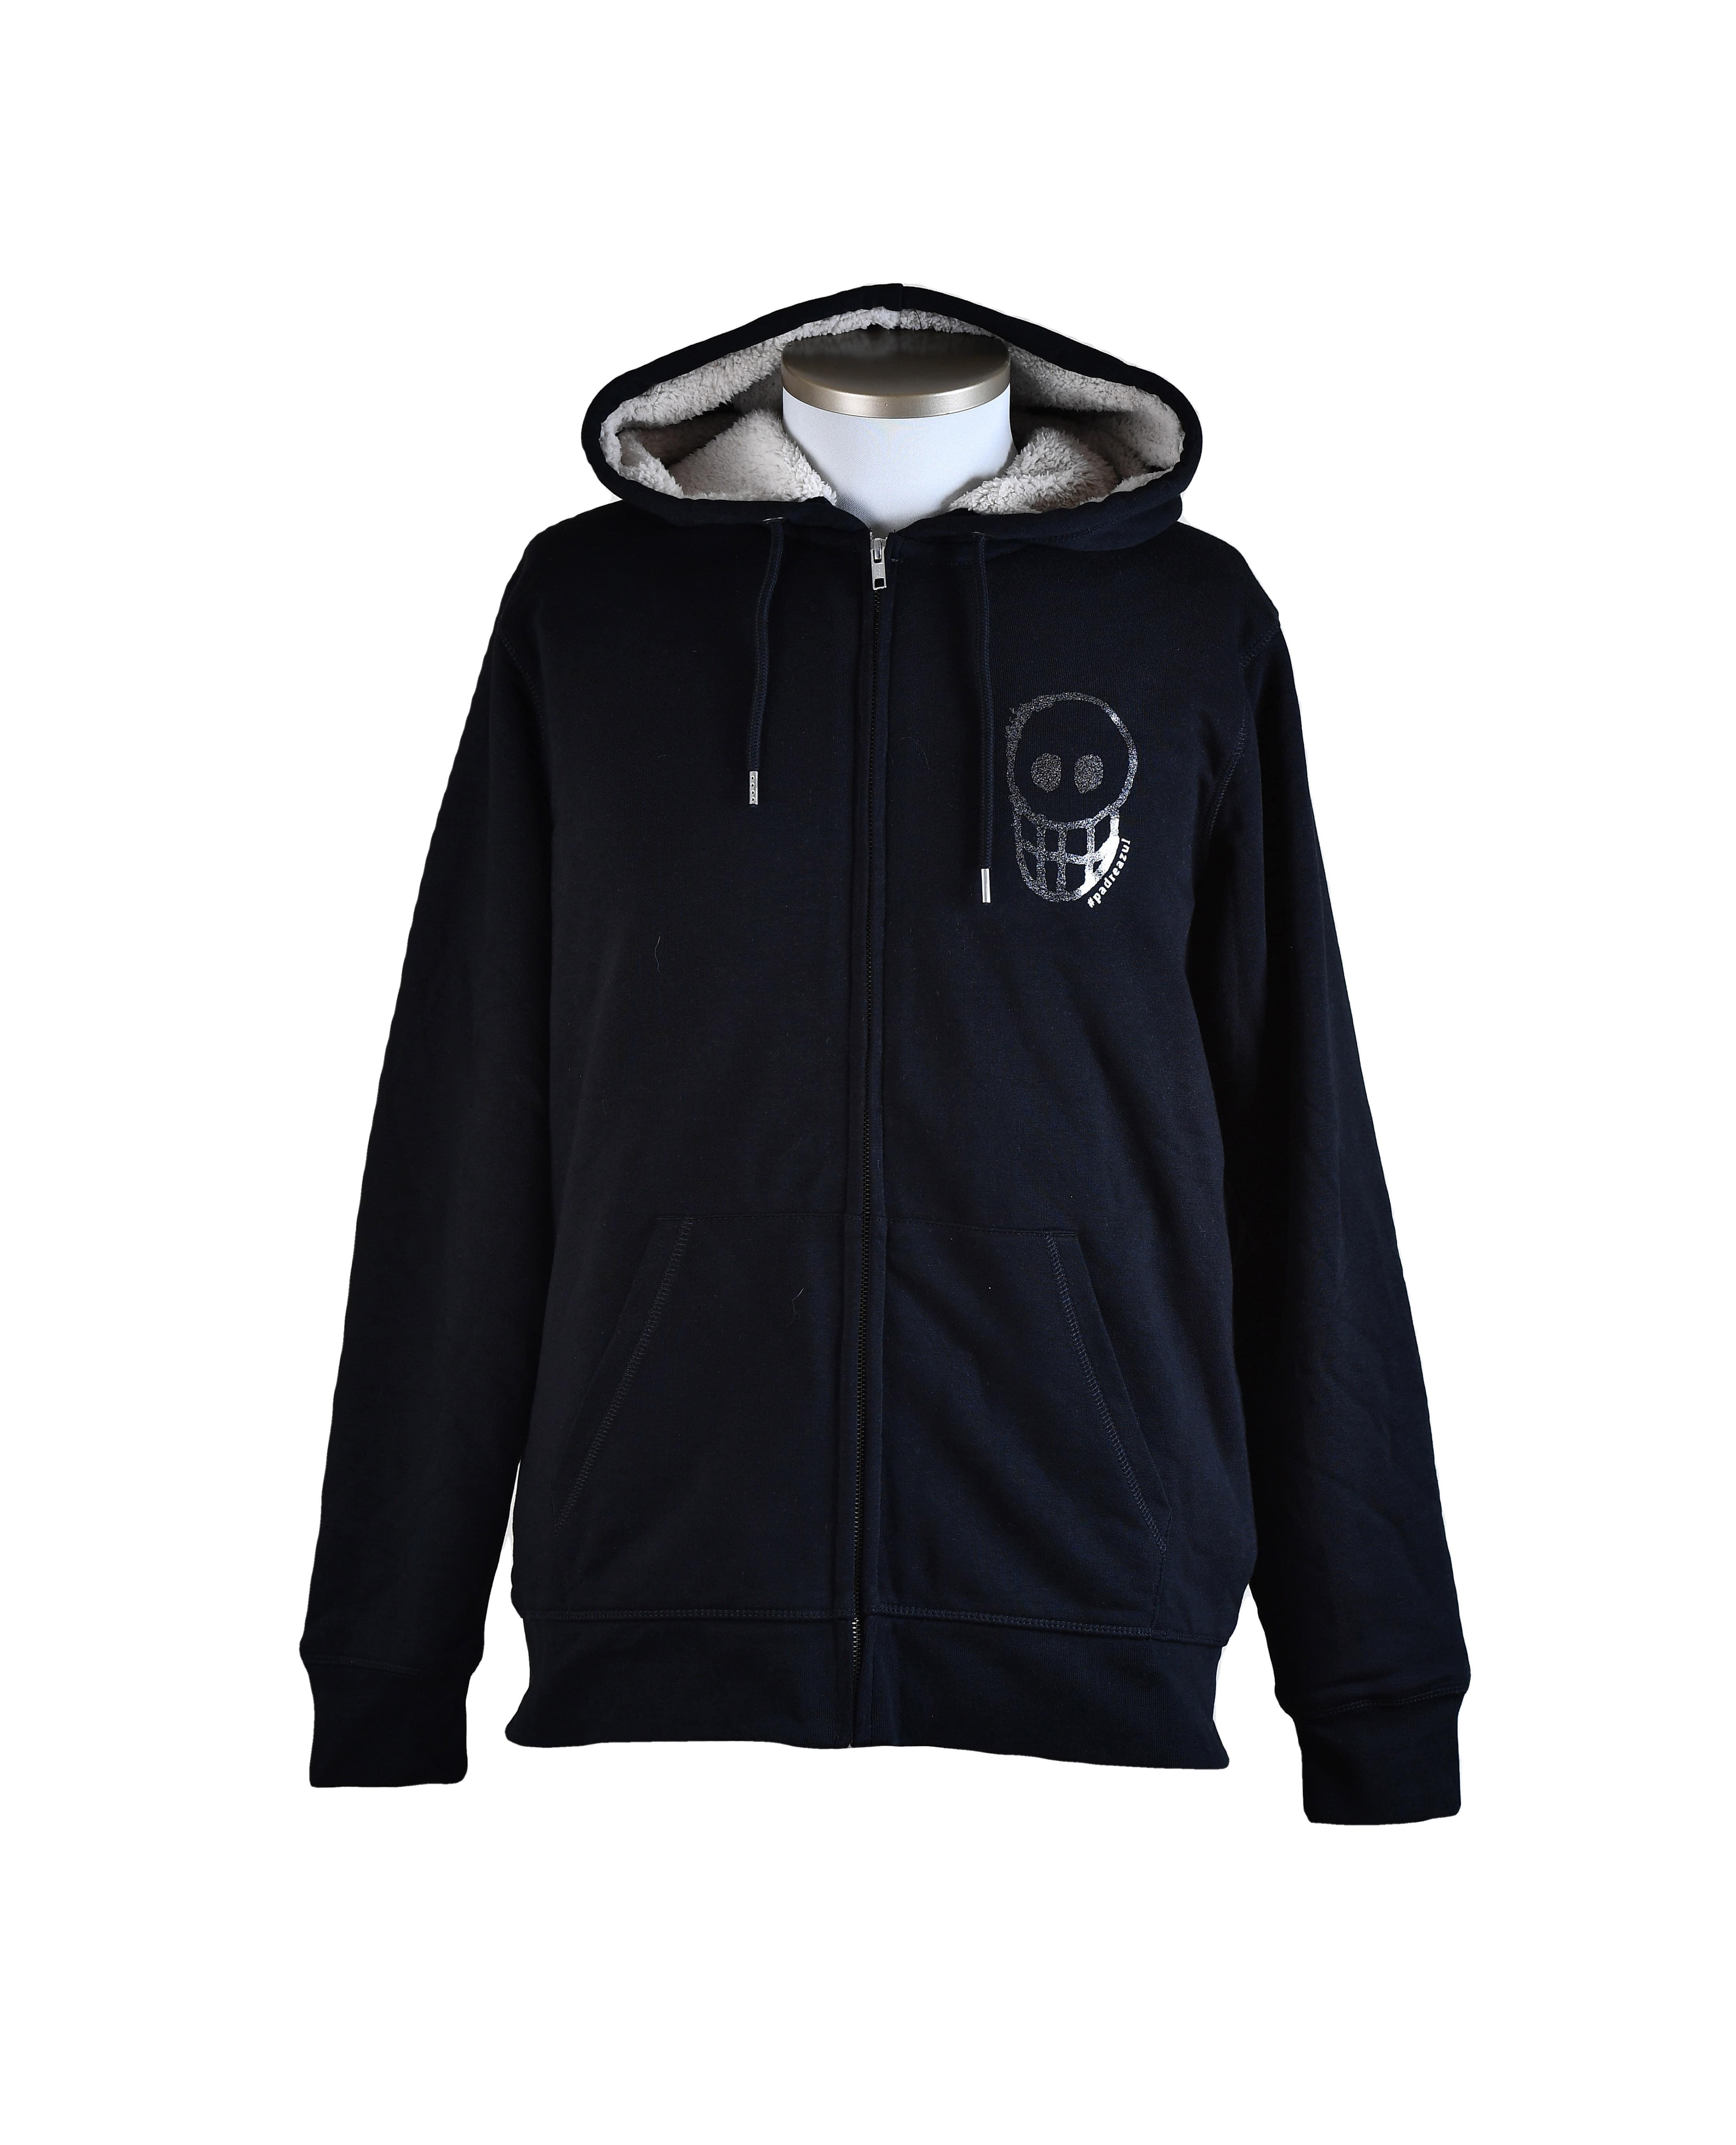 Warm Ramon Sherpa hooded sweater with zipper and Sherpa lining